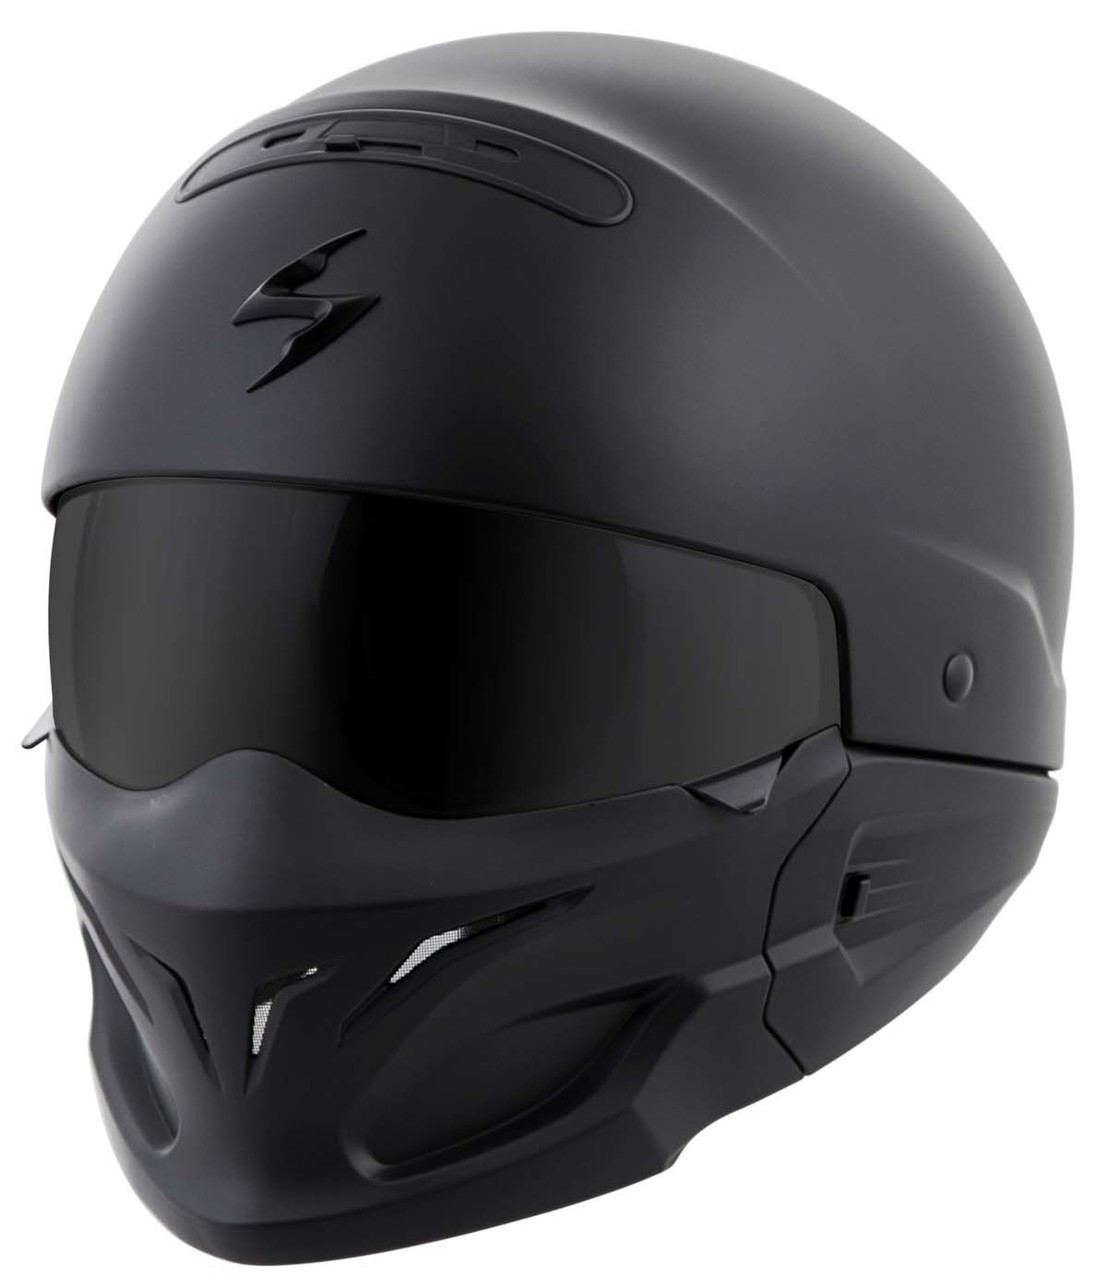 Scorpion Covert Solid Helmet Matte Black | XtremeHelmets.com